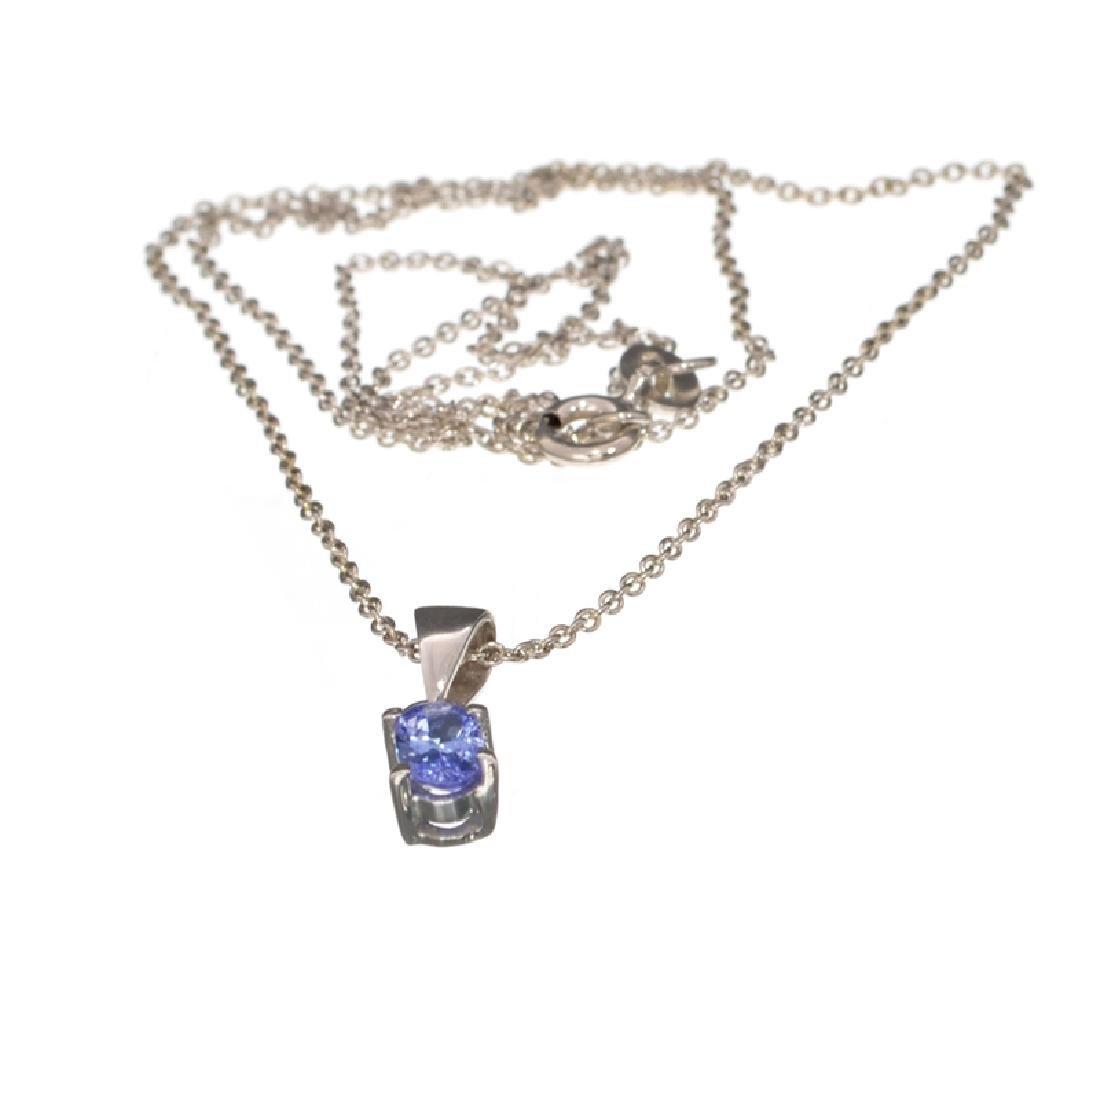 APP: 0.5k Fine Jewelry 0.44CT Oval Cut Tanzanite Over